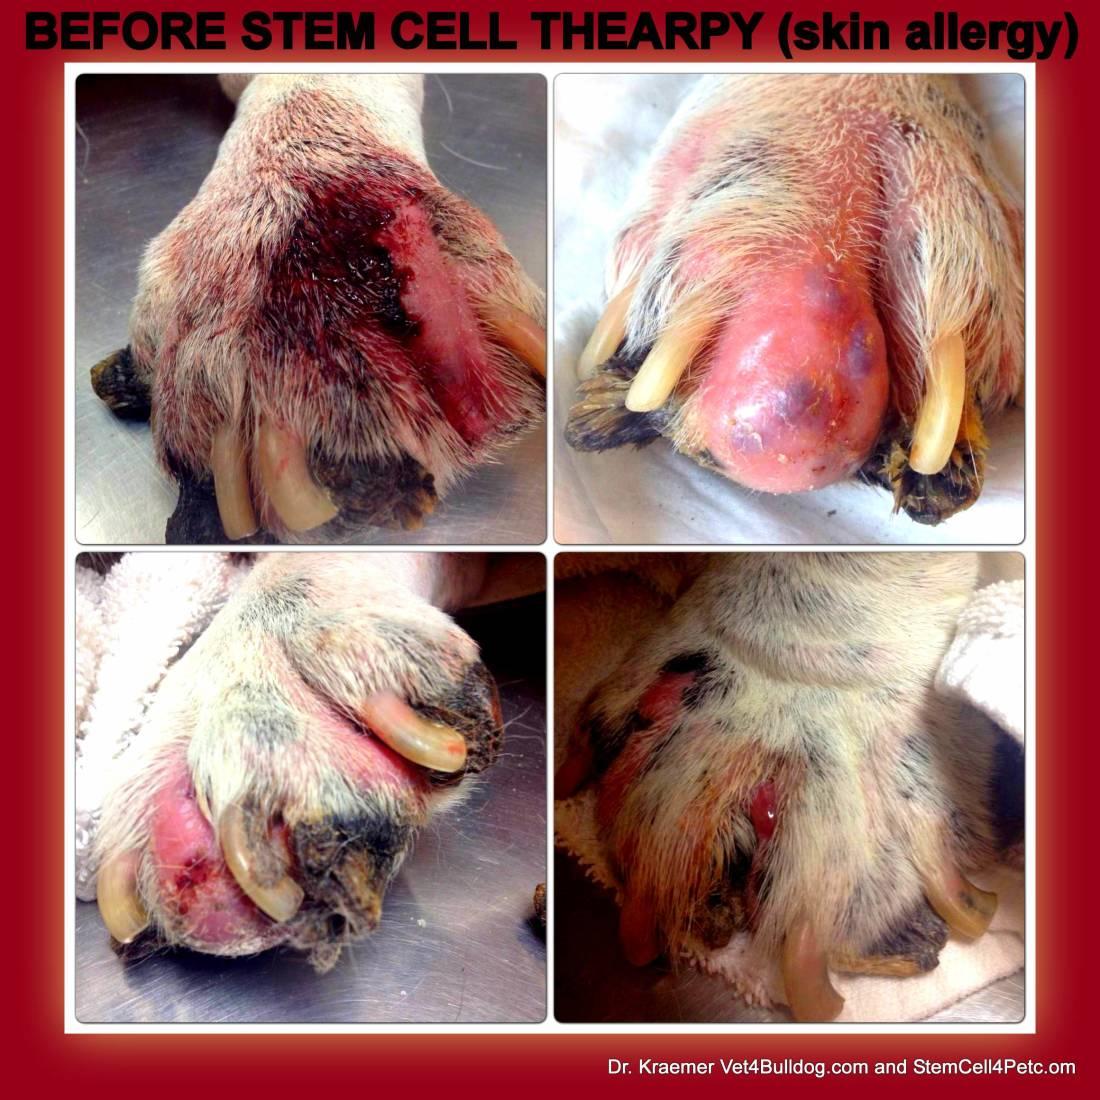 Canine facial dermatitis